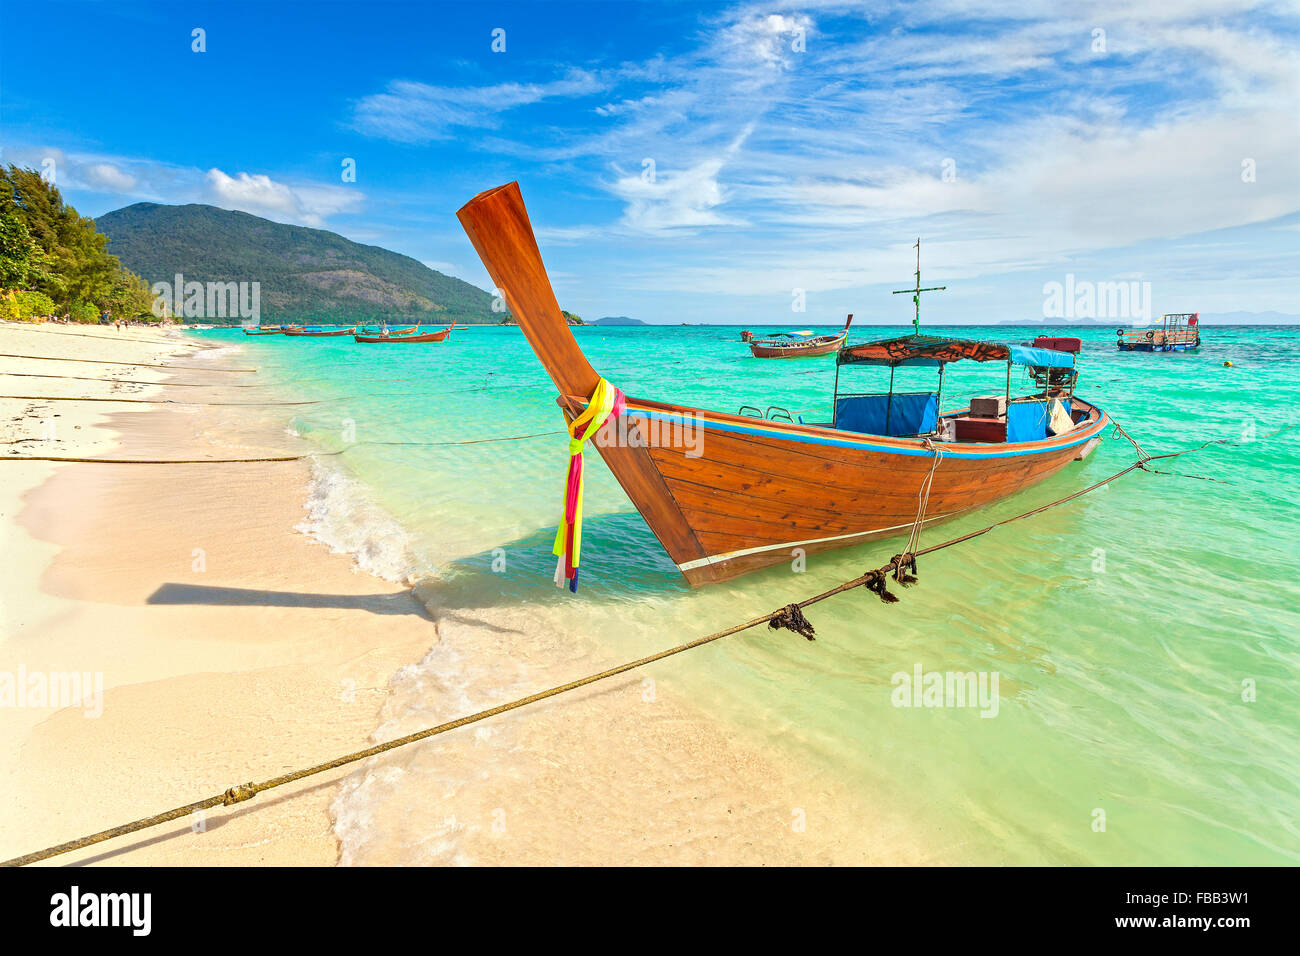 Long tail boat at a beautiful beach, Thailand. - Stock Image